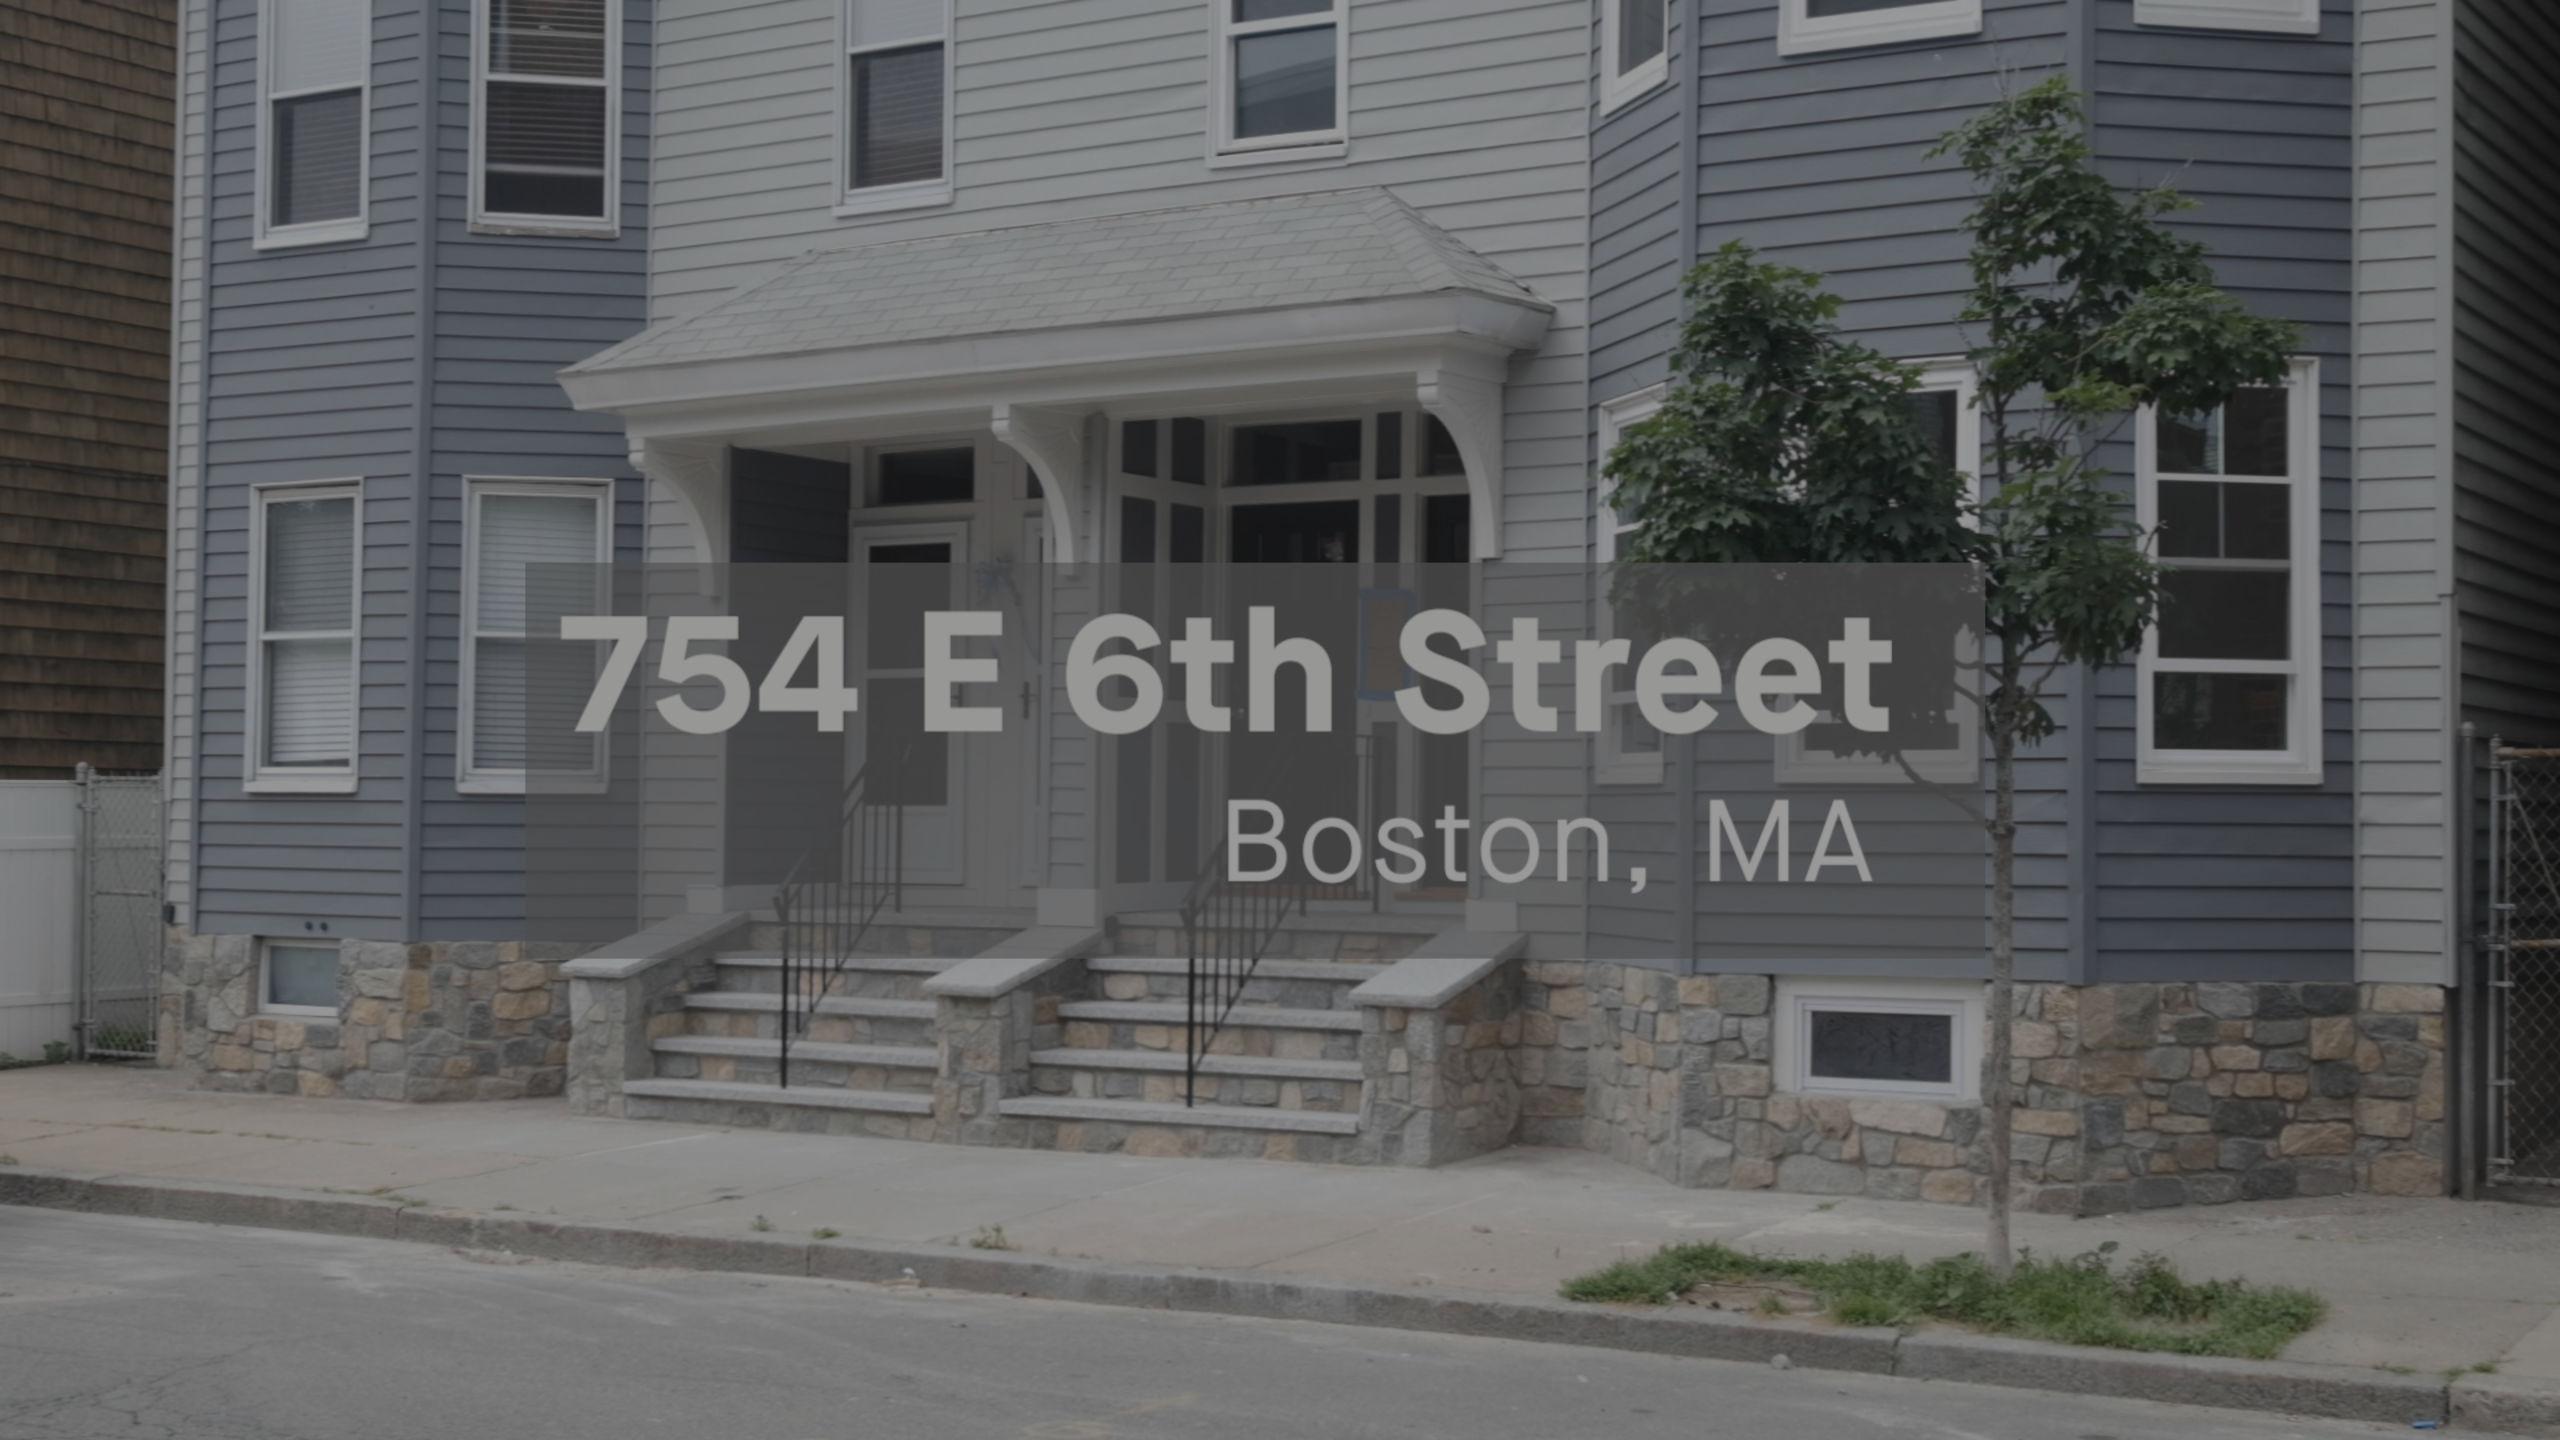 754 East 6 th street Boston MA